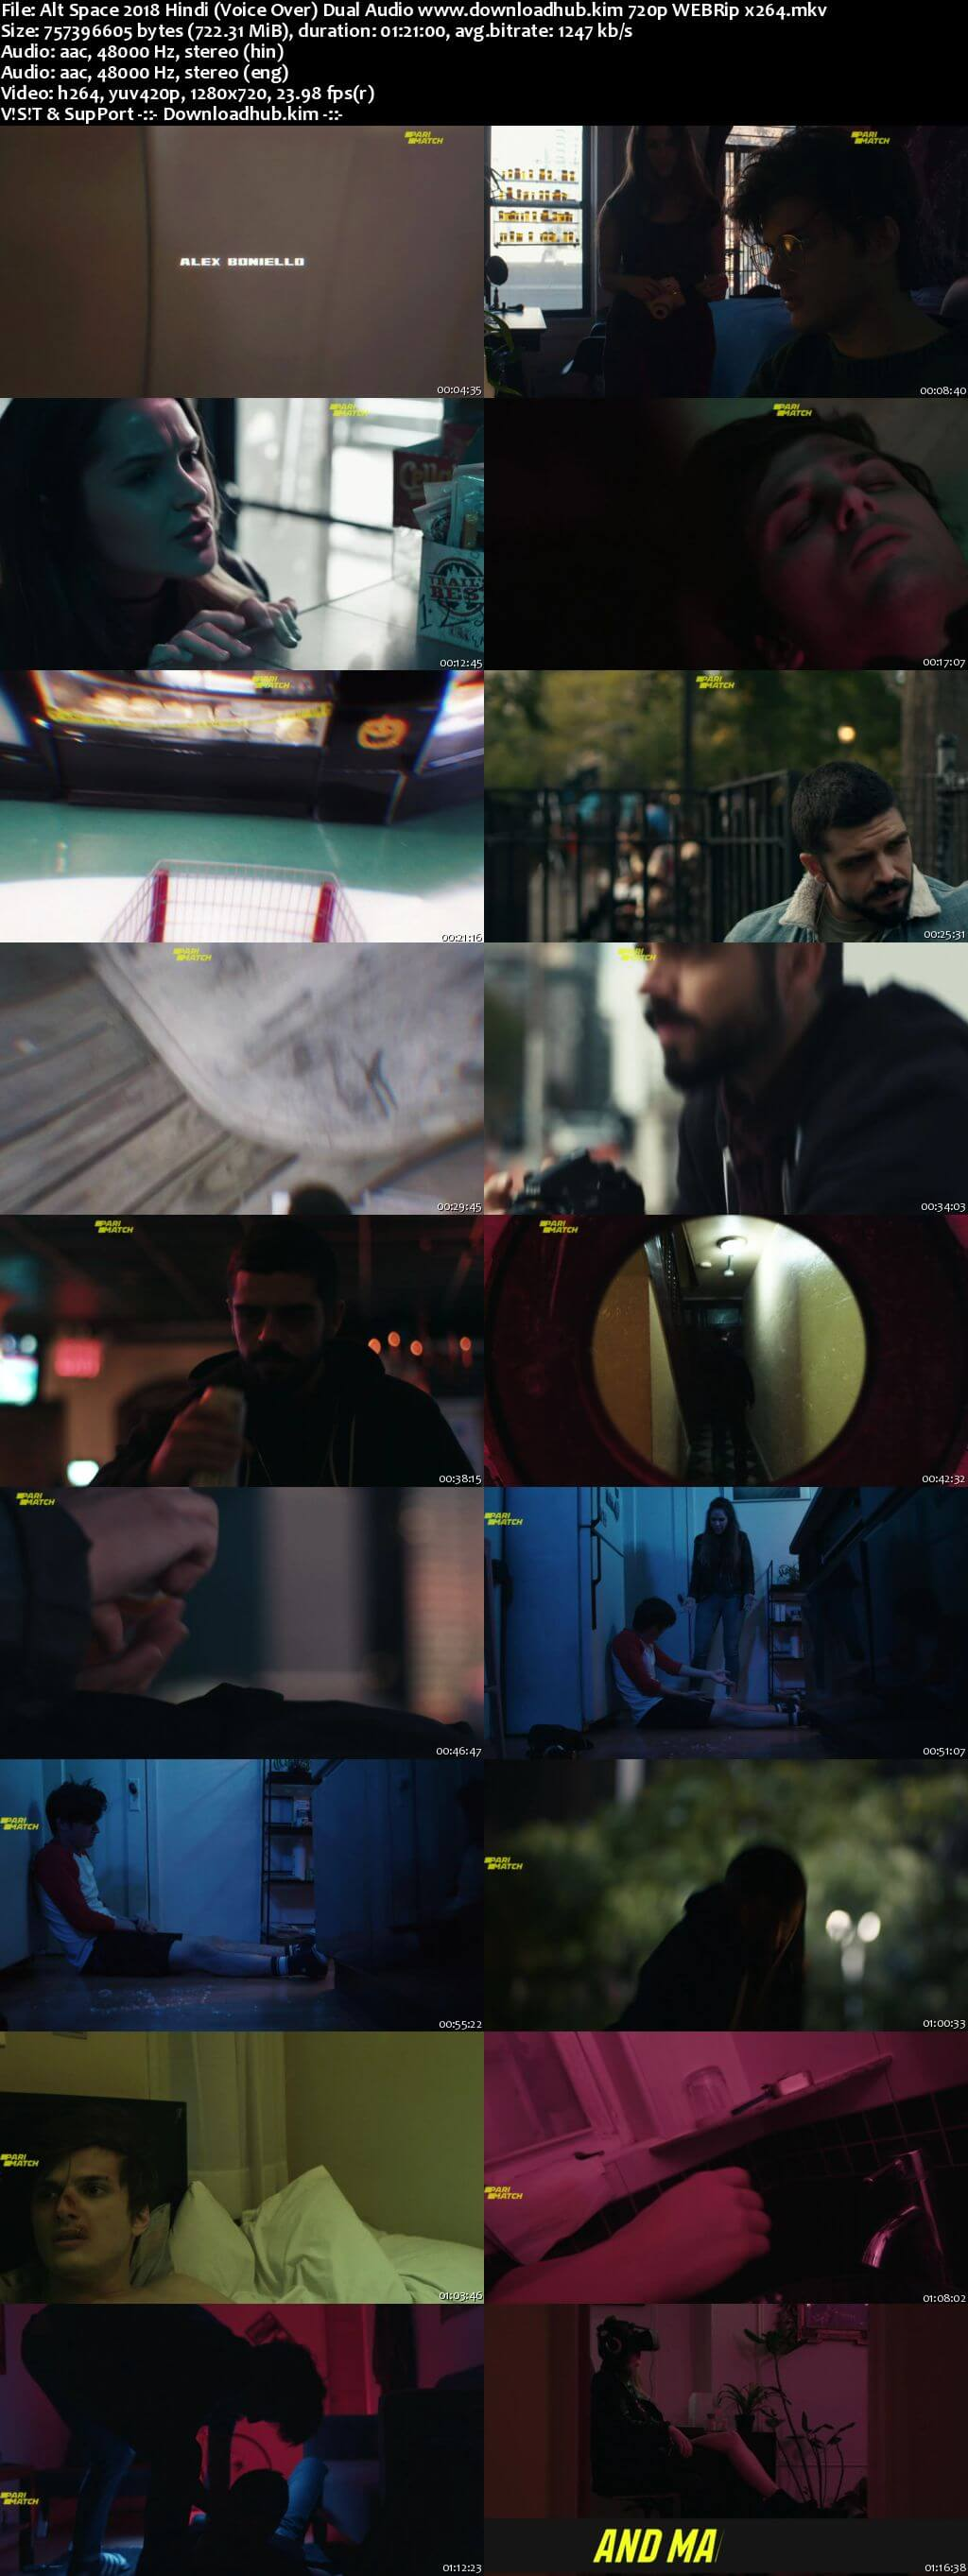 Alt Space 2018 Hindi (Voice Over) Dual Audio 720p WEBRip x264